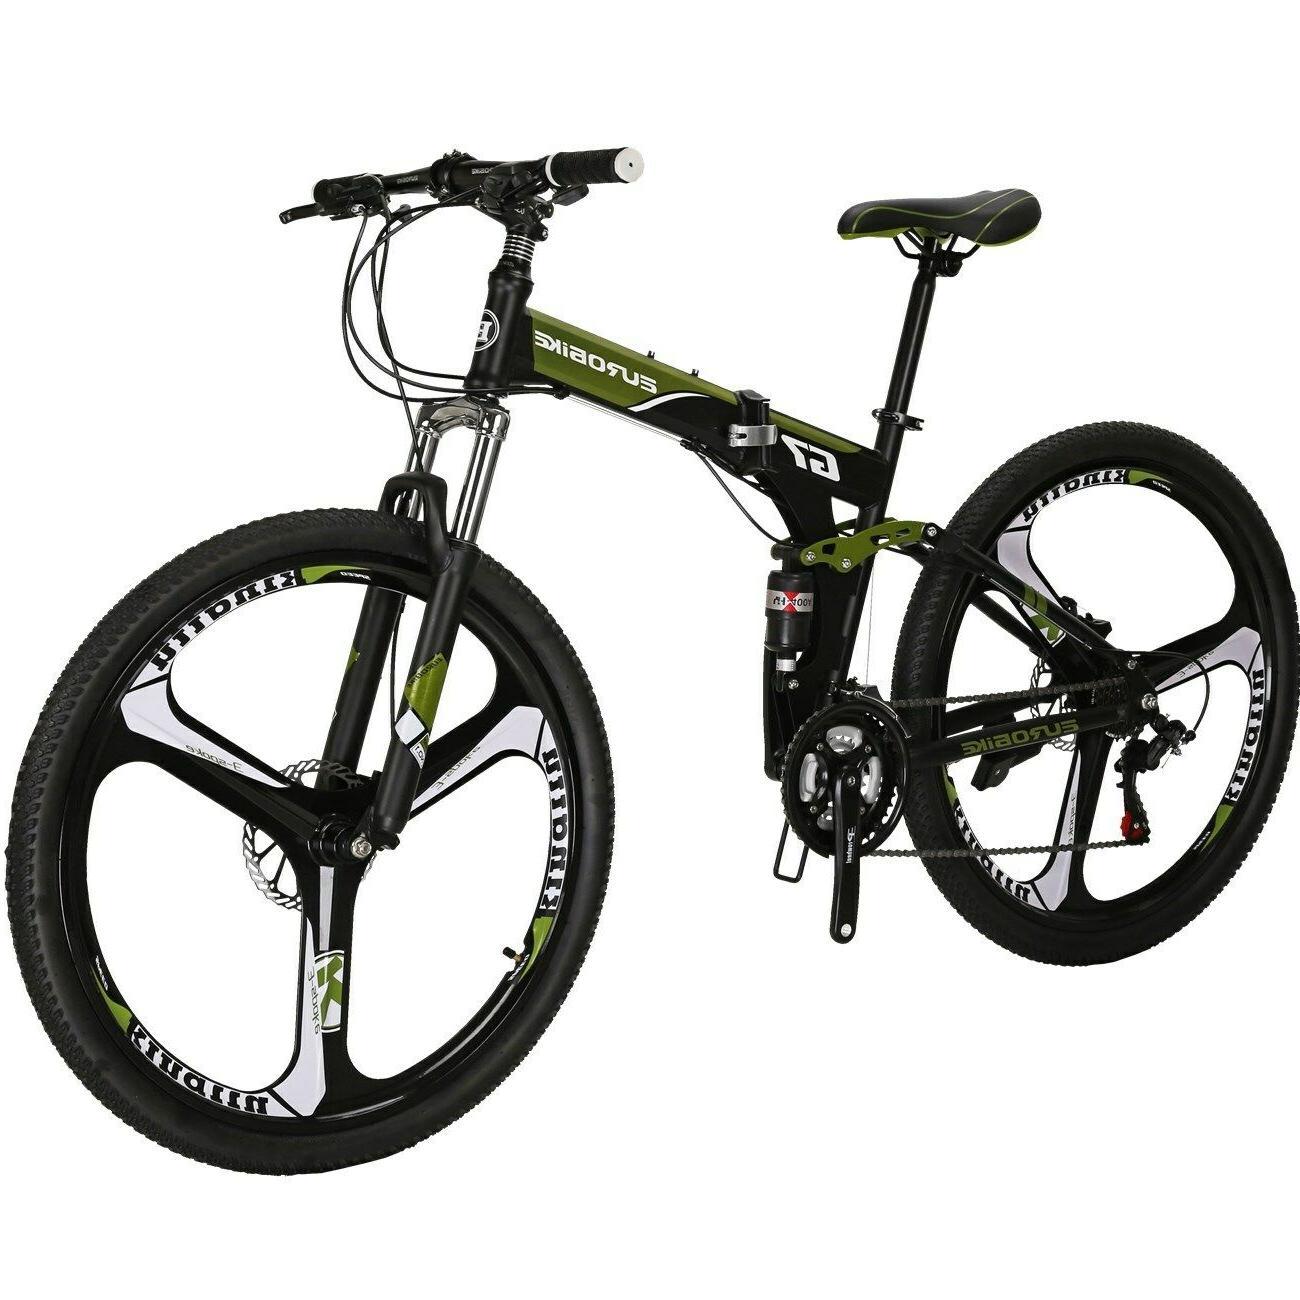 g7 folding mountain bike 21 speed full